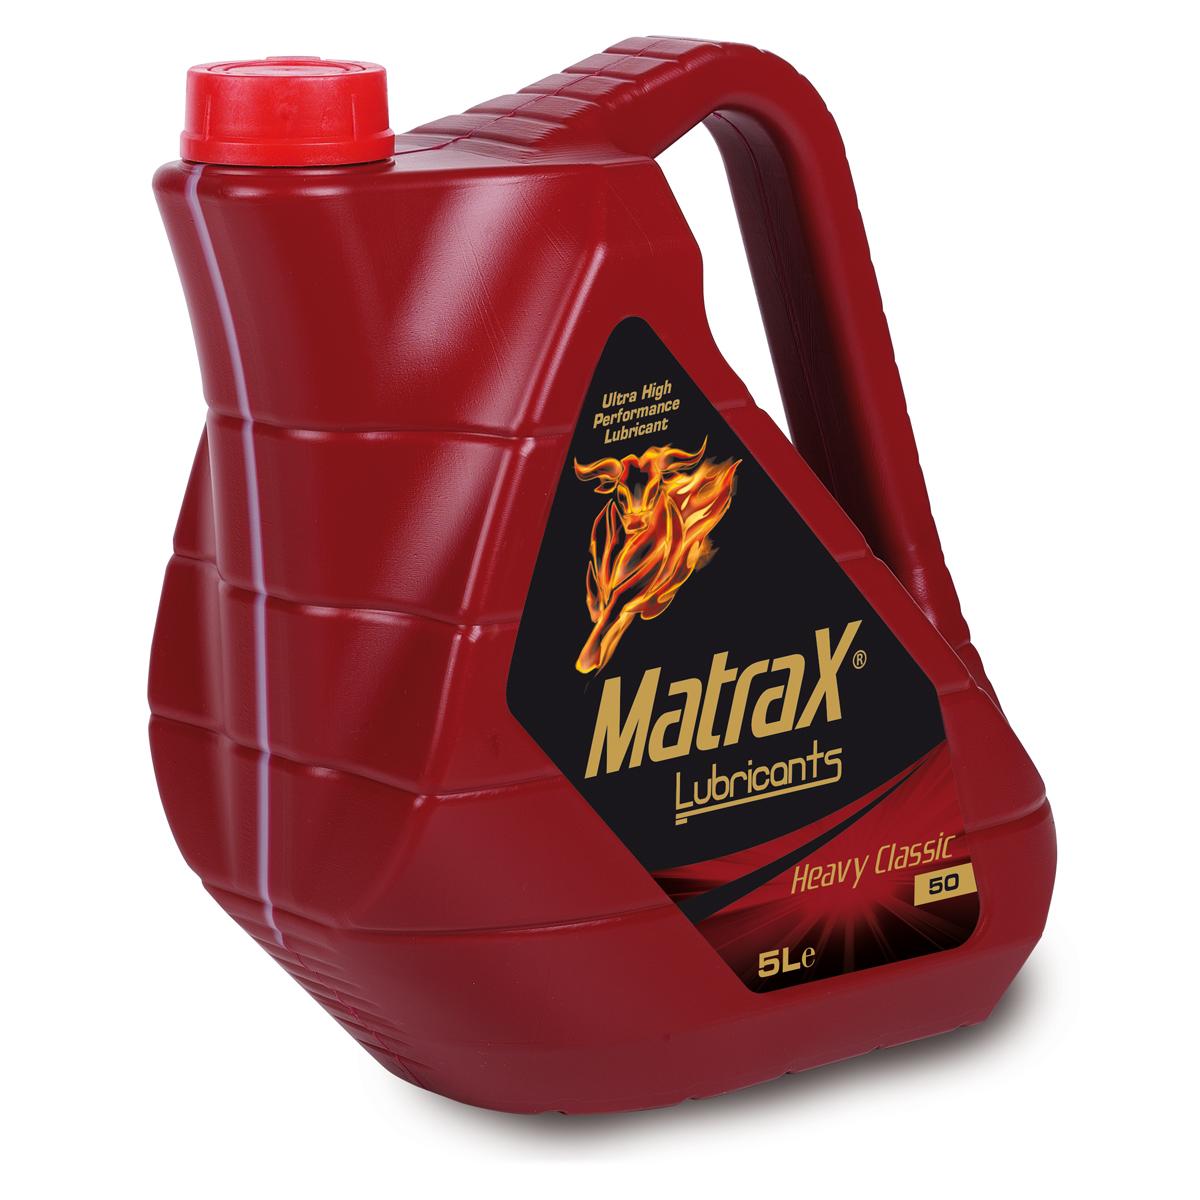 matrax-lubricants-heavy-classic-50-5l